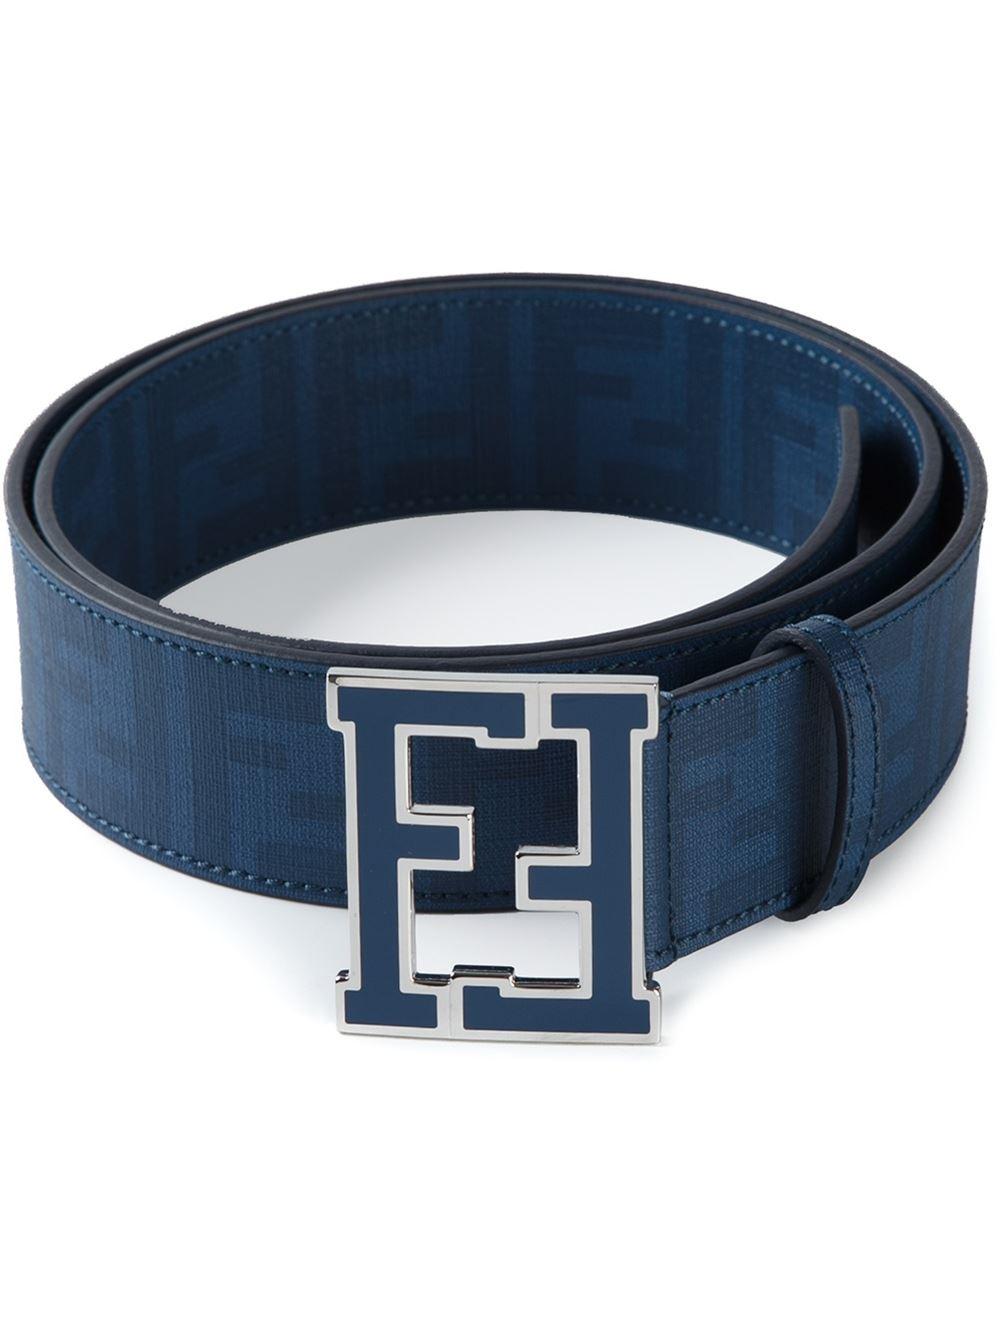 526723aaf50c ... cheapest lyst fendi ff logo buckle belt in blue for men 4fbbc c4d09